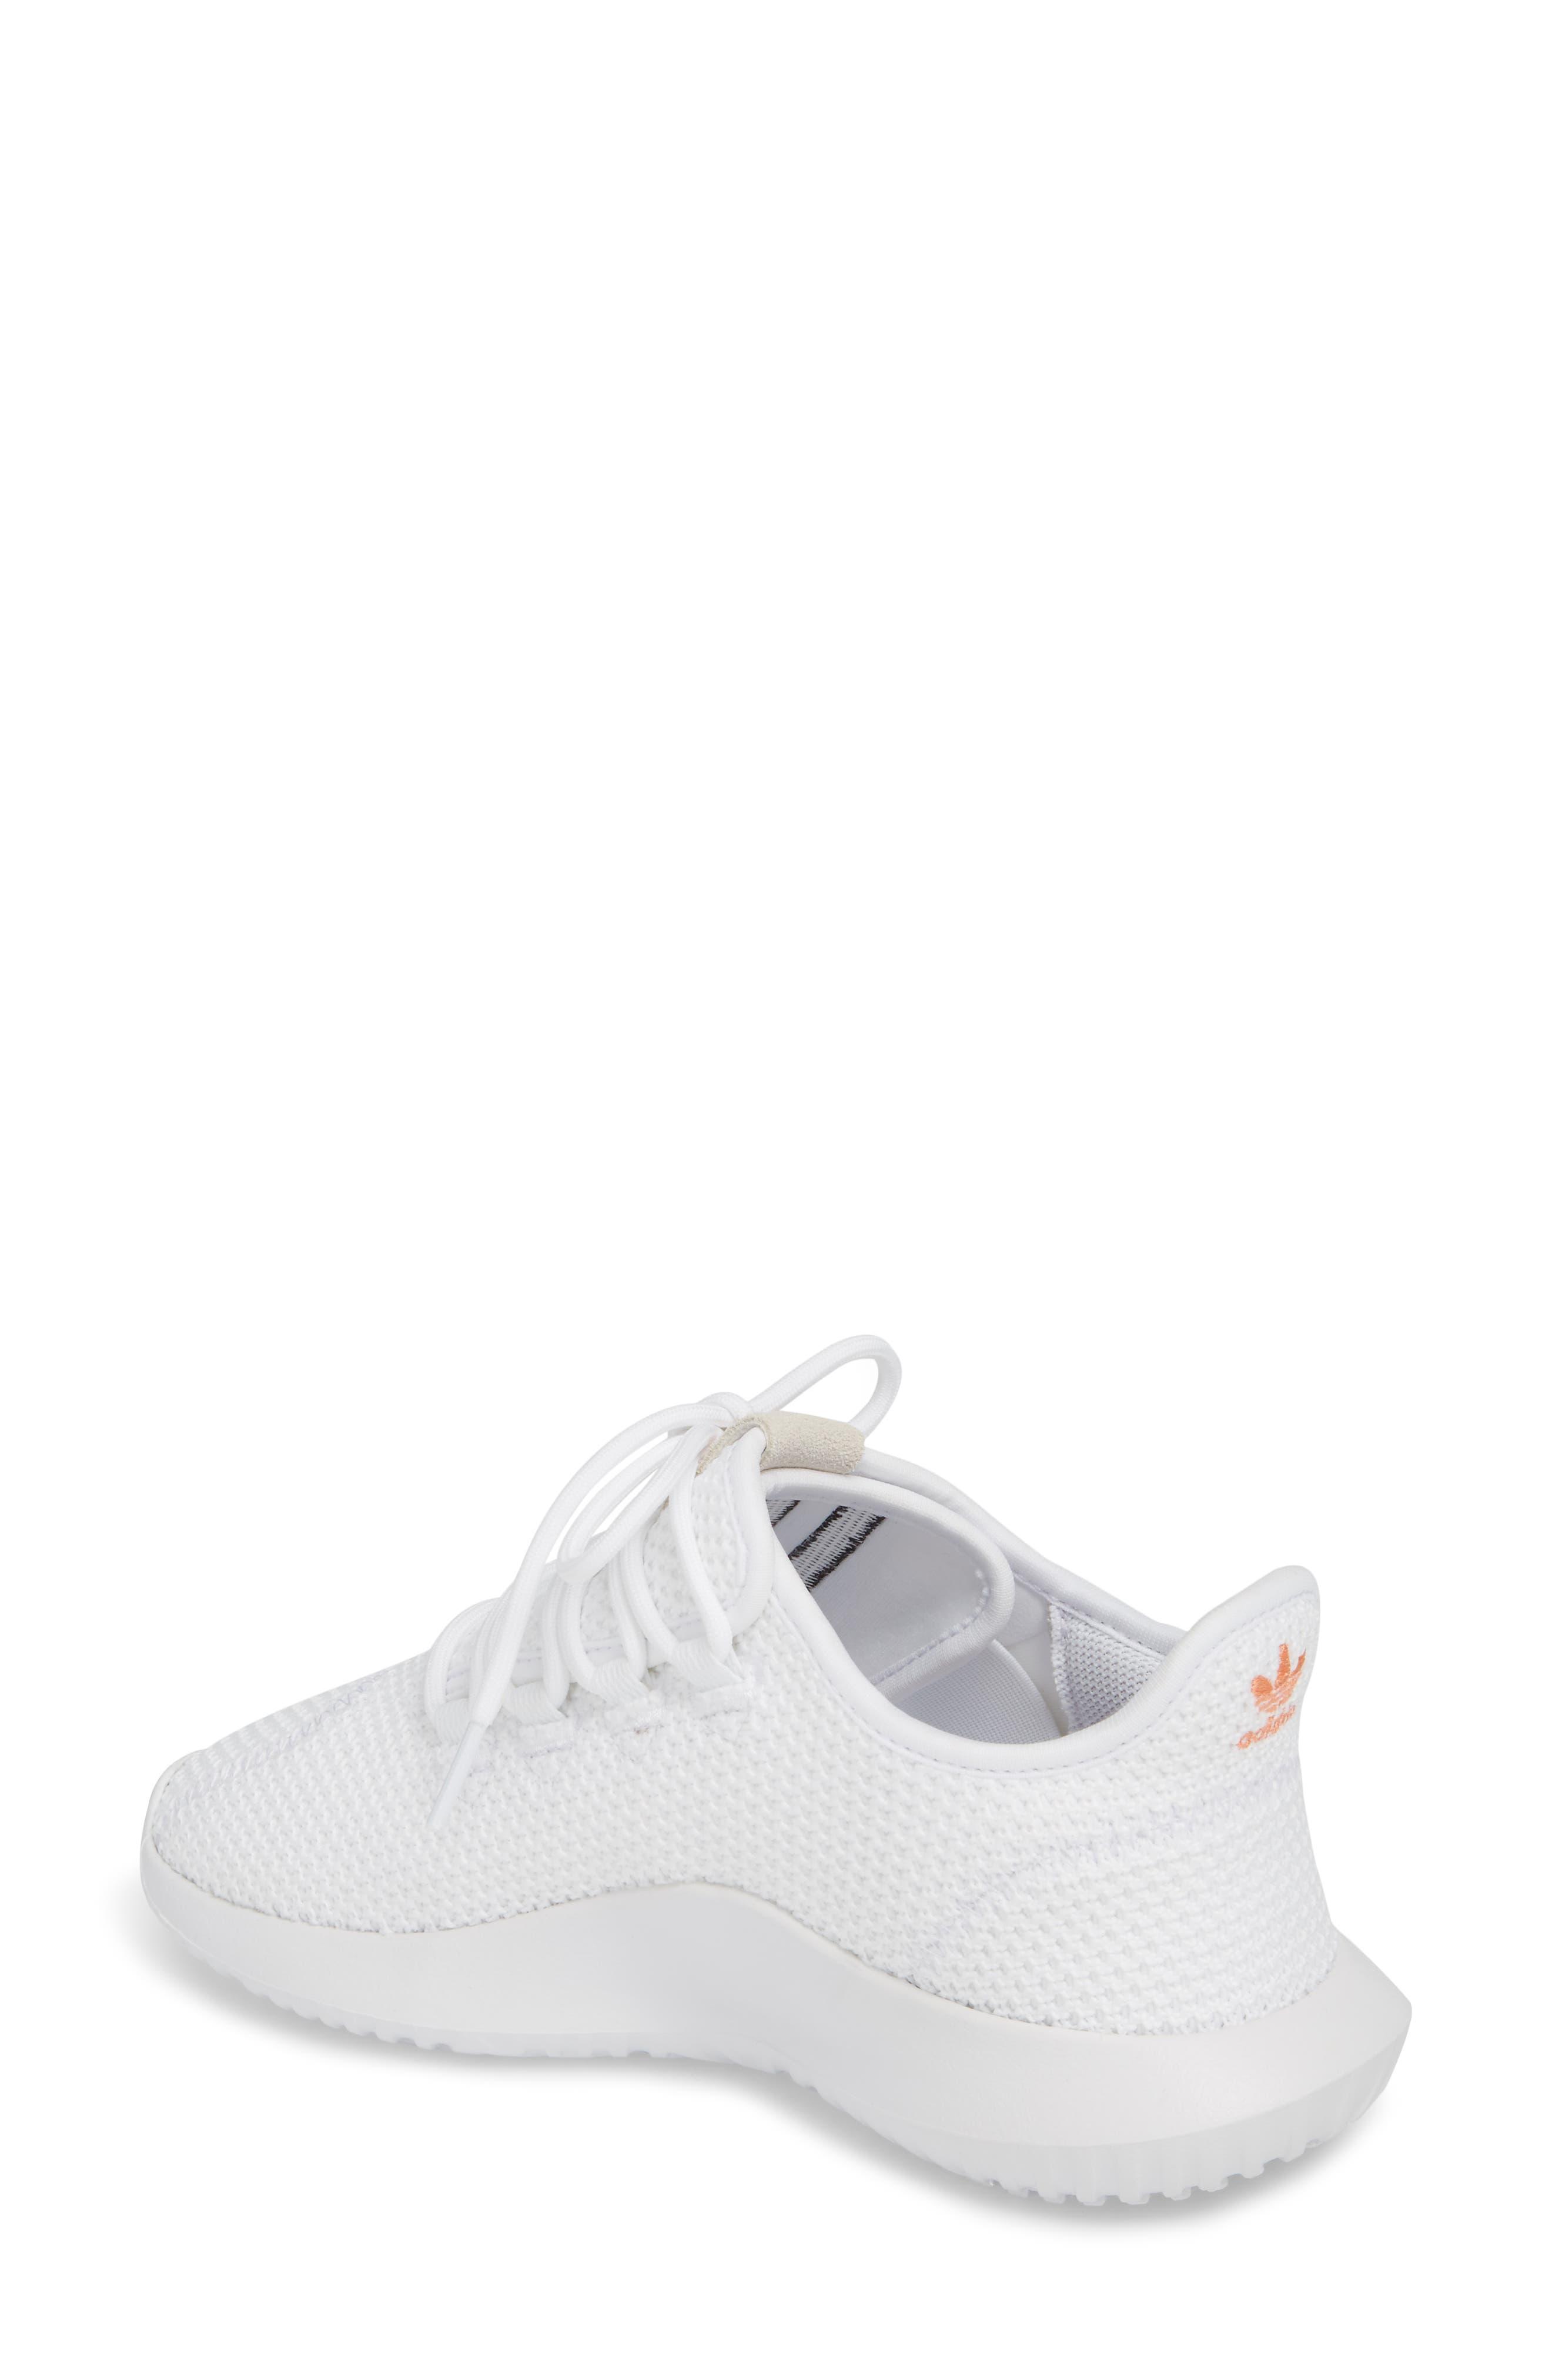 Tubular Shadow Sneaker,                             Alternate thumbnail 2, color,                             White/ White/ Core Black